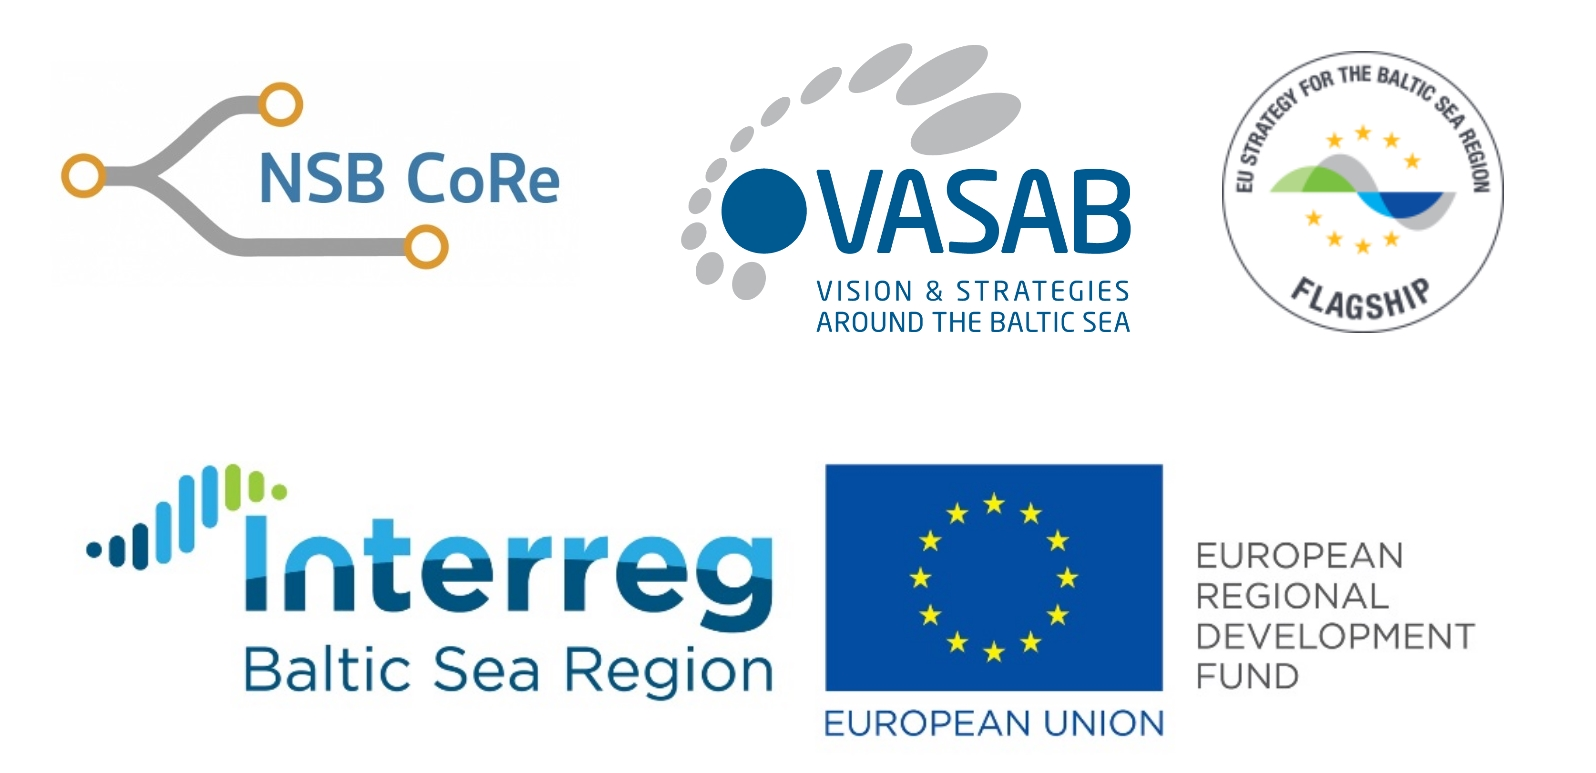 nsb_core_registration_logo